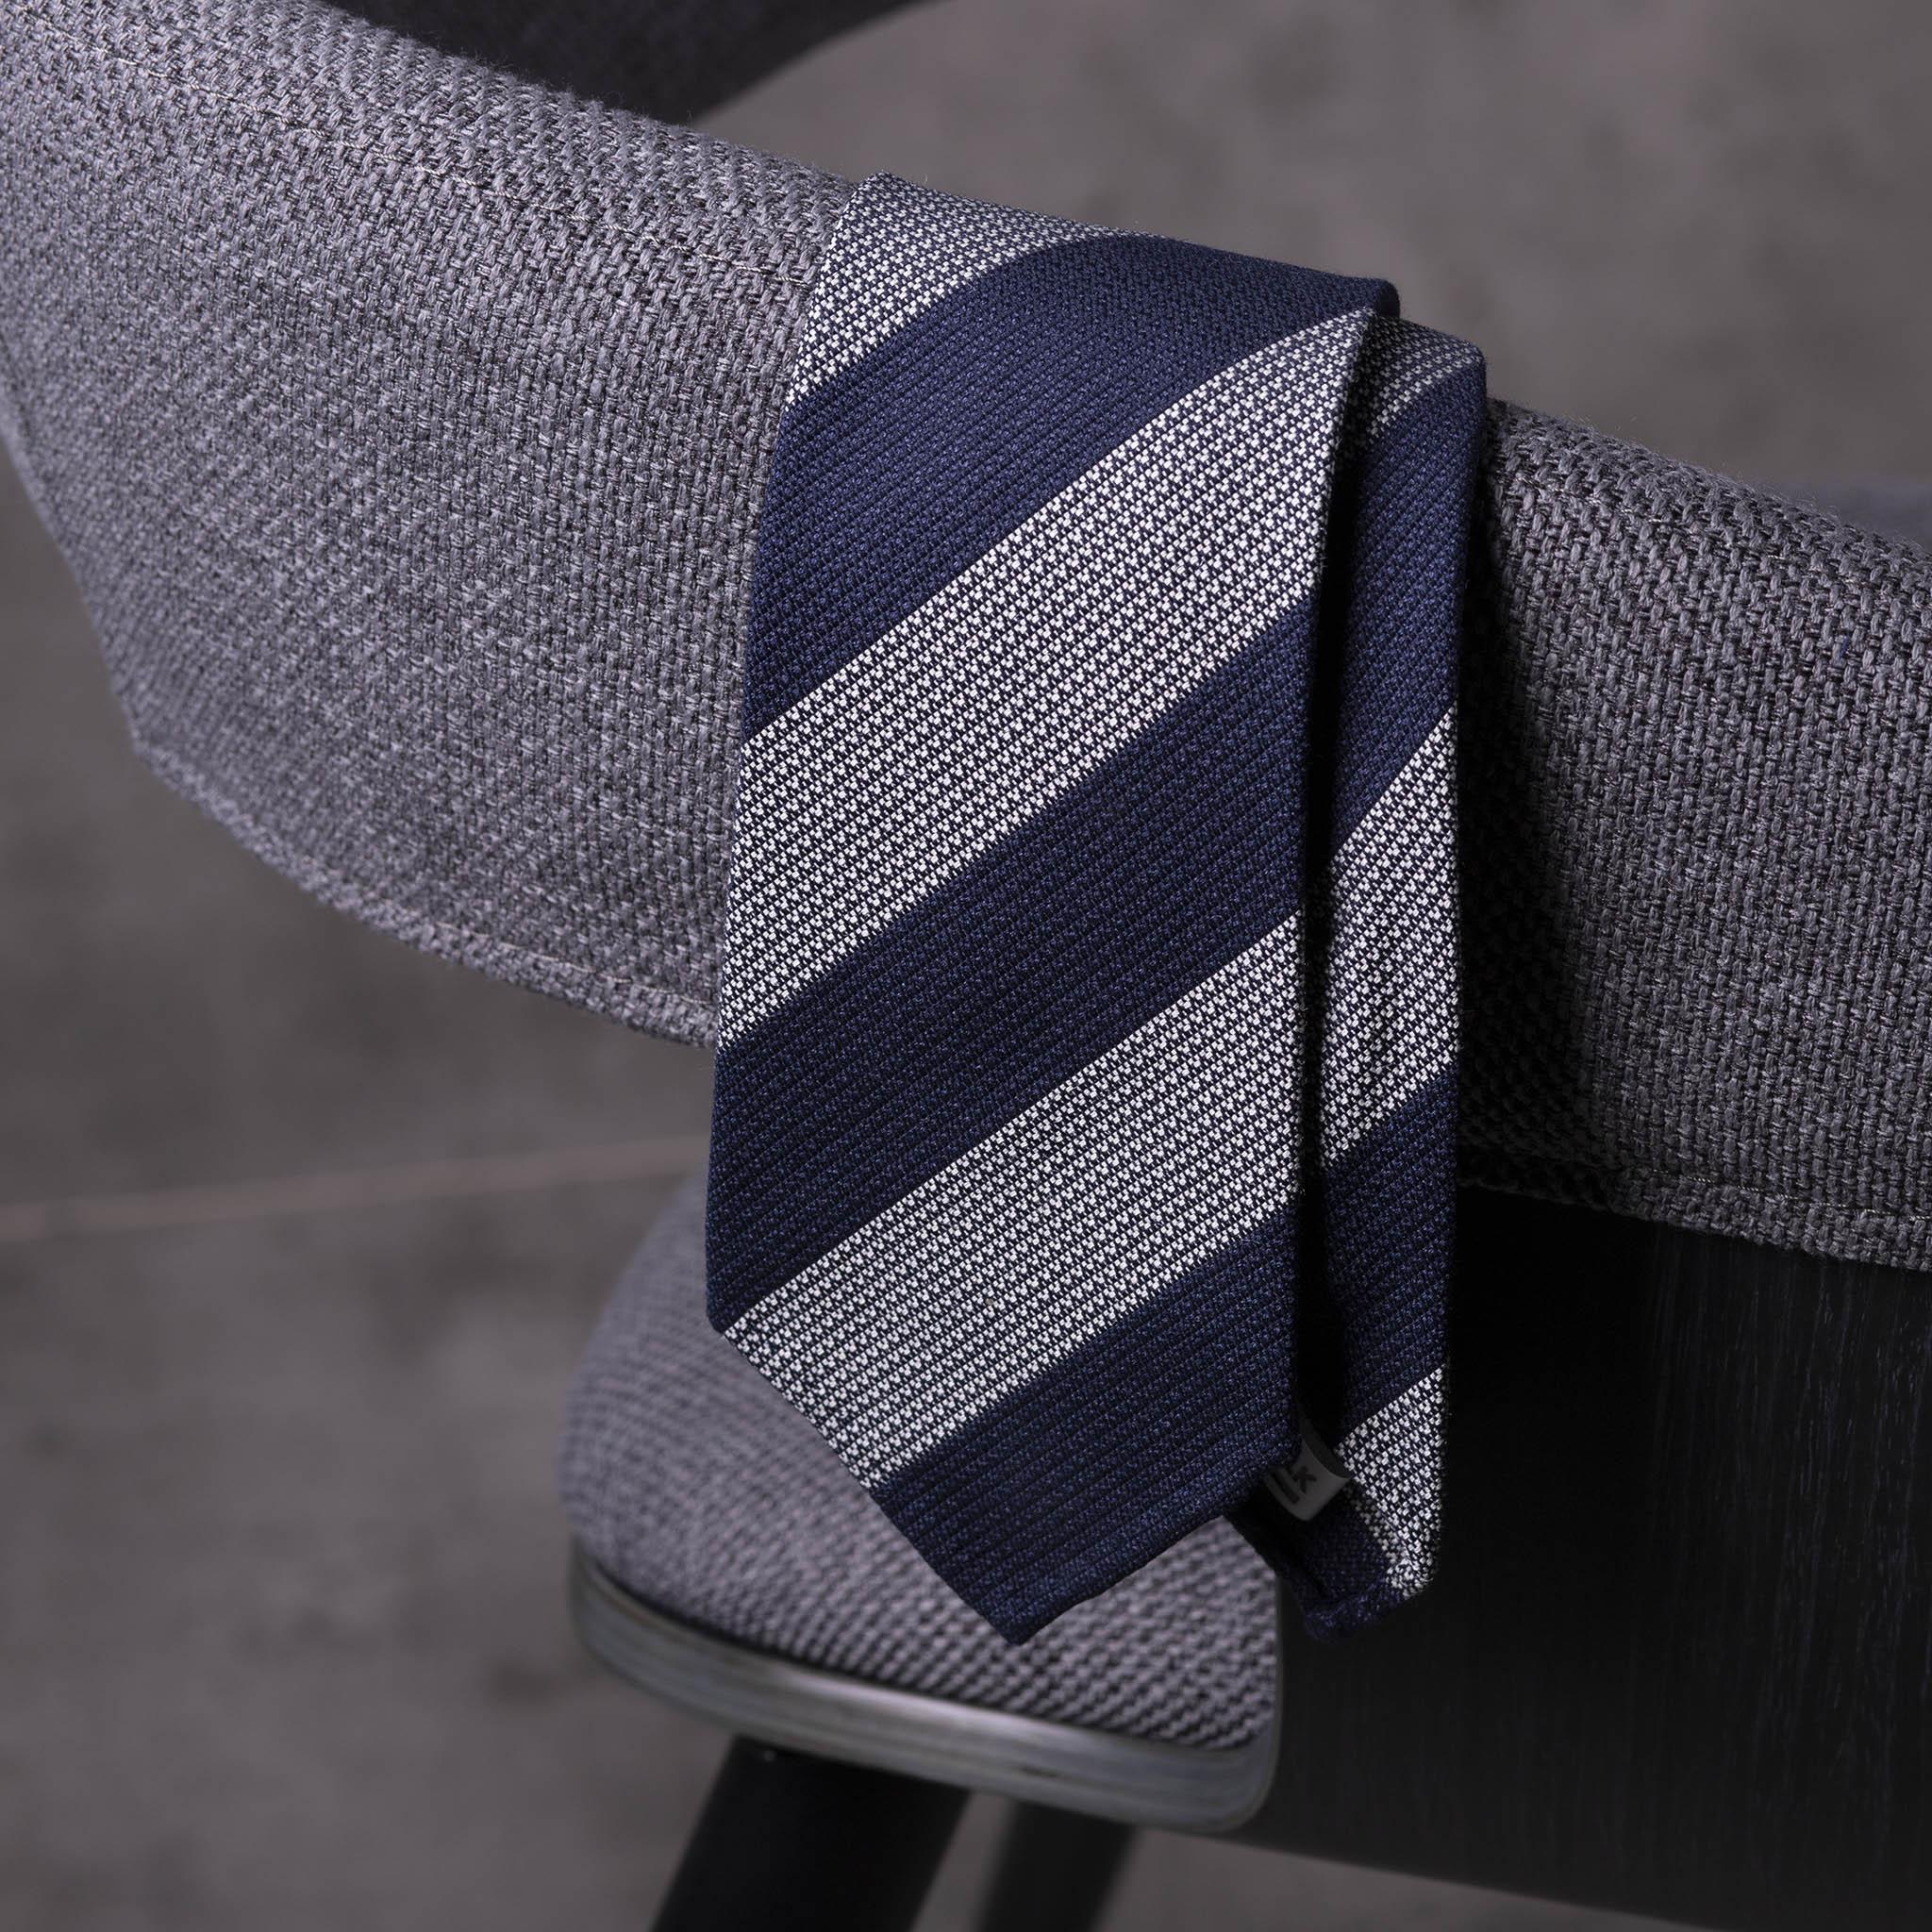 WOOL-SILK-GRENADINE-SEDA-LANA-0481-Tie-Initials-Corbata-Iniciales-The-Seelk-3